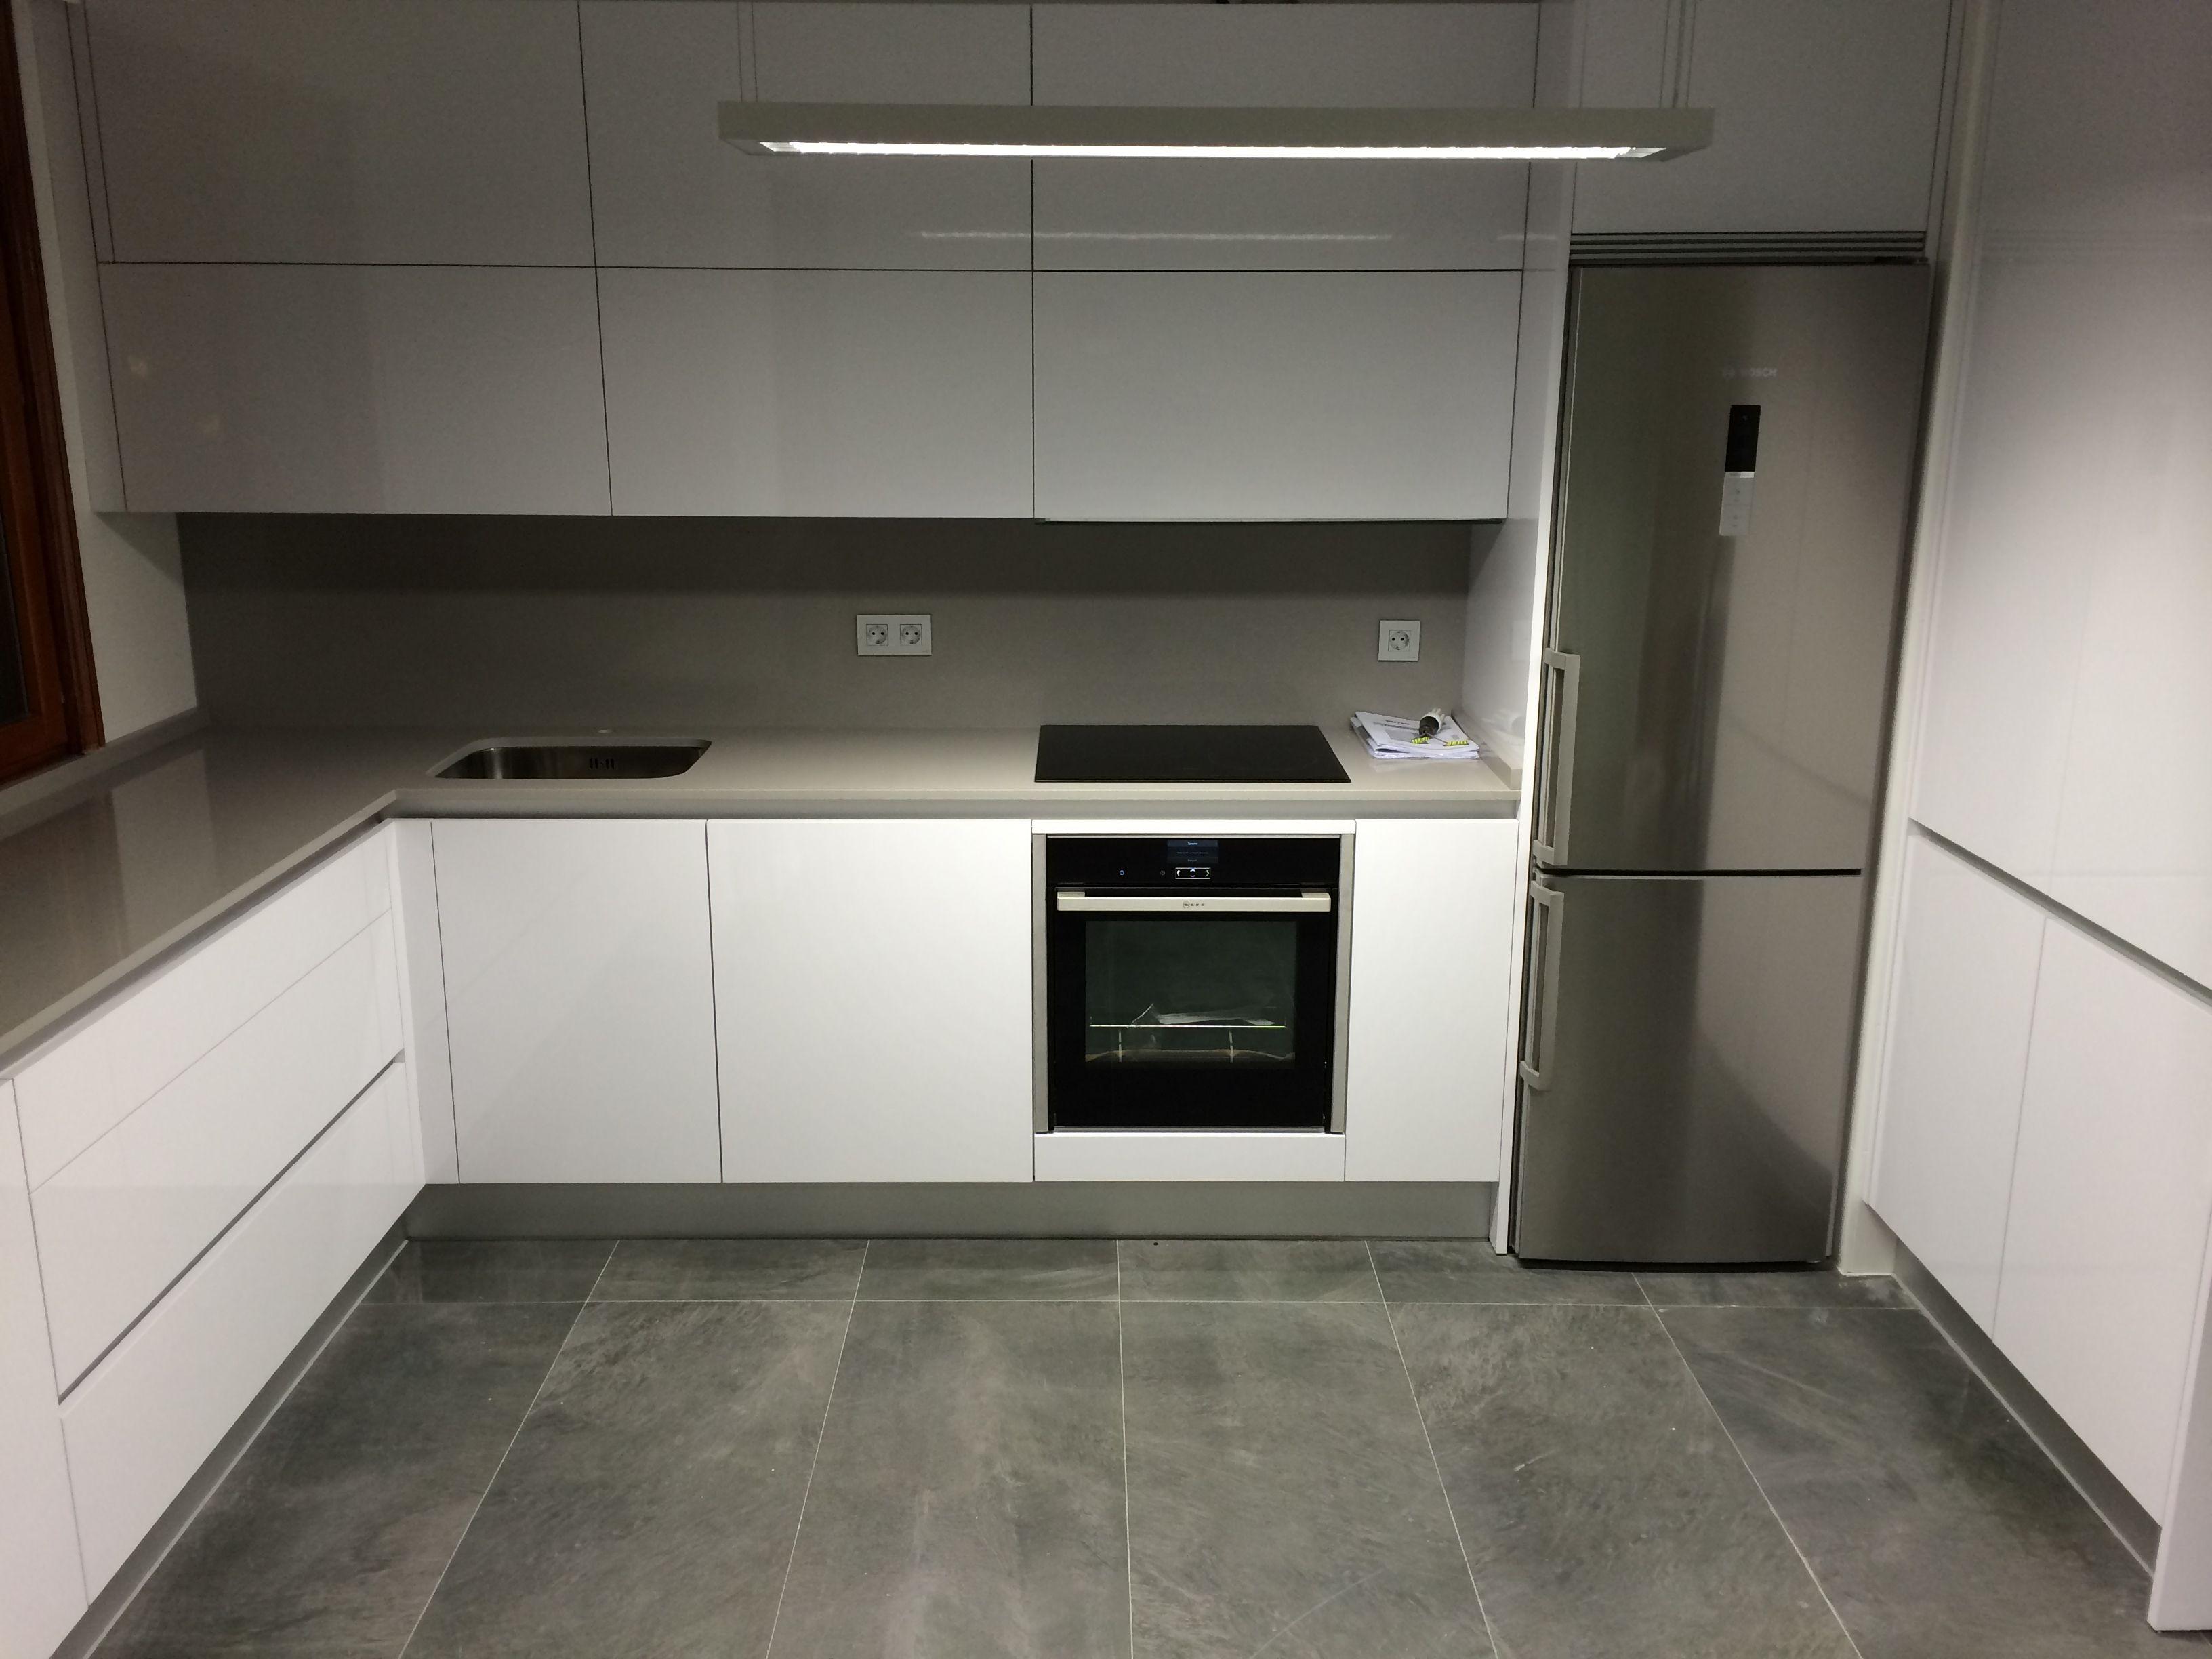 Cocina moderna blanca y solo gris oscuro cocinas for Cocinas modernas en gris y blanco